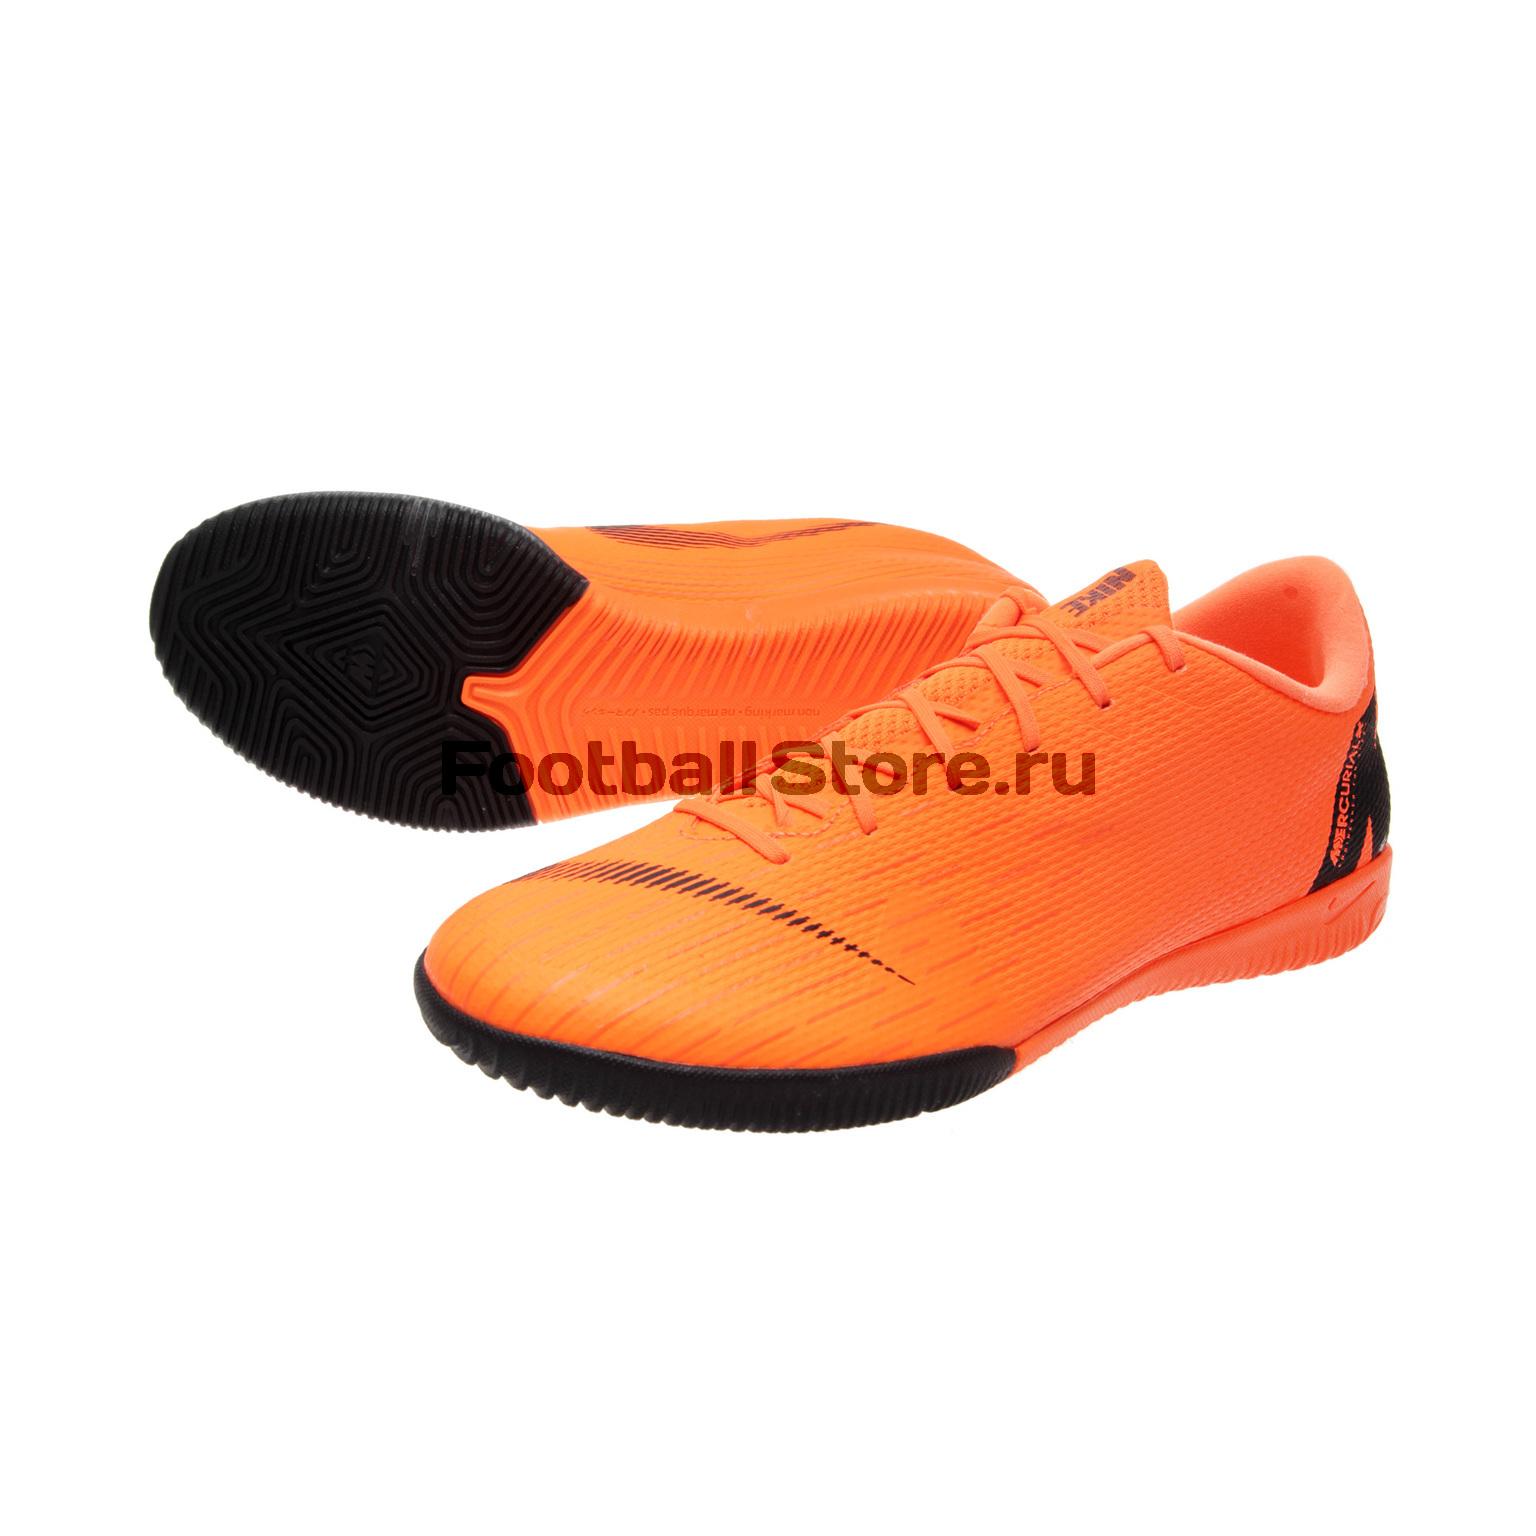 Обувь для зала Nike VaporX 12 Academy IC AH7383-810 шиповки nike vaporx 12 pro tf ah7388 810